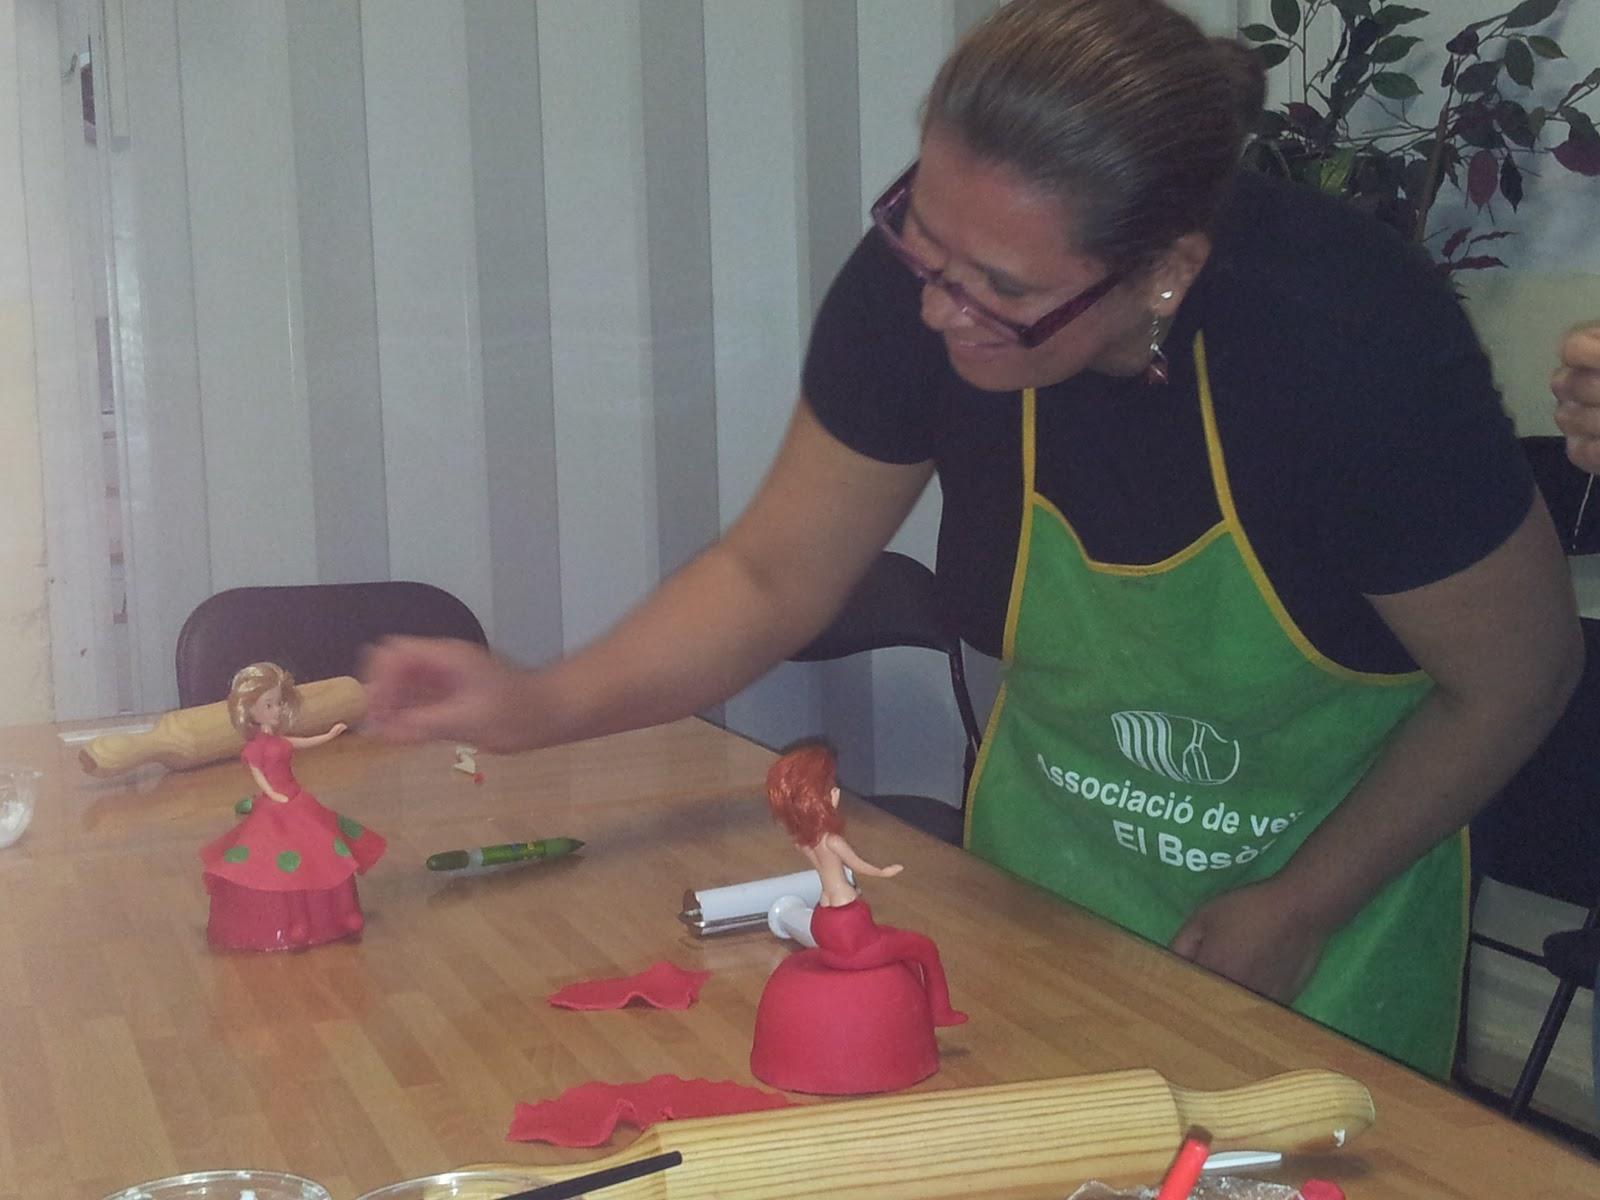 Curso ayudante de cocina reposter a camarero manipulador alimentos barcelona noviembre 2012 - Curso de ayudante de cocina ...